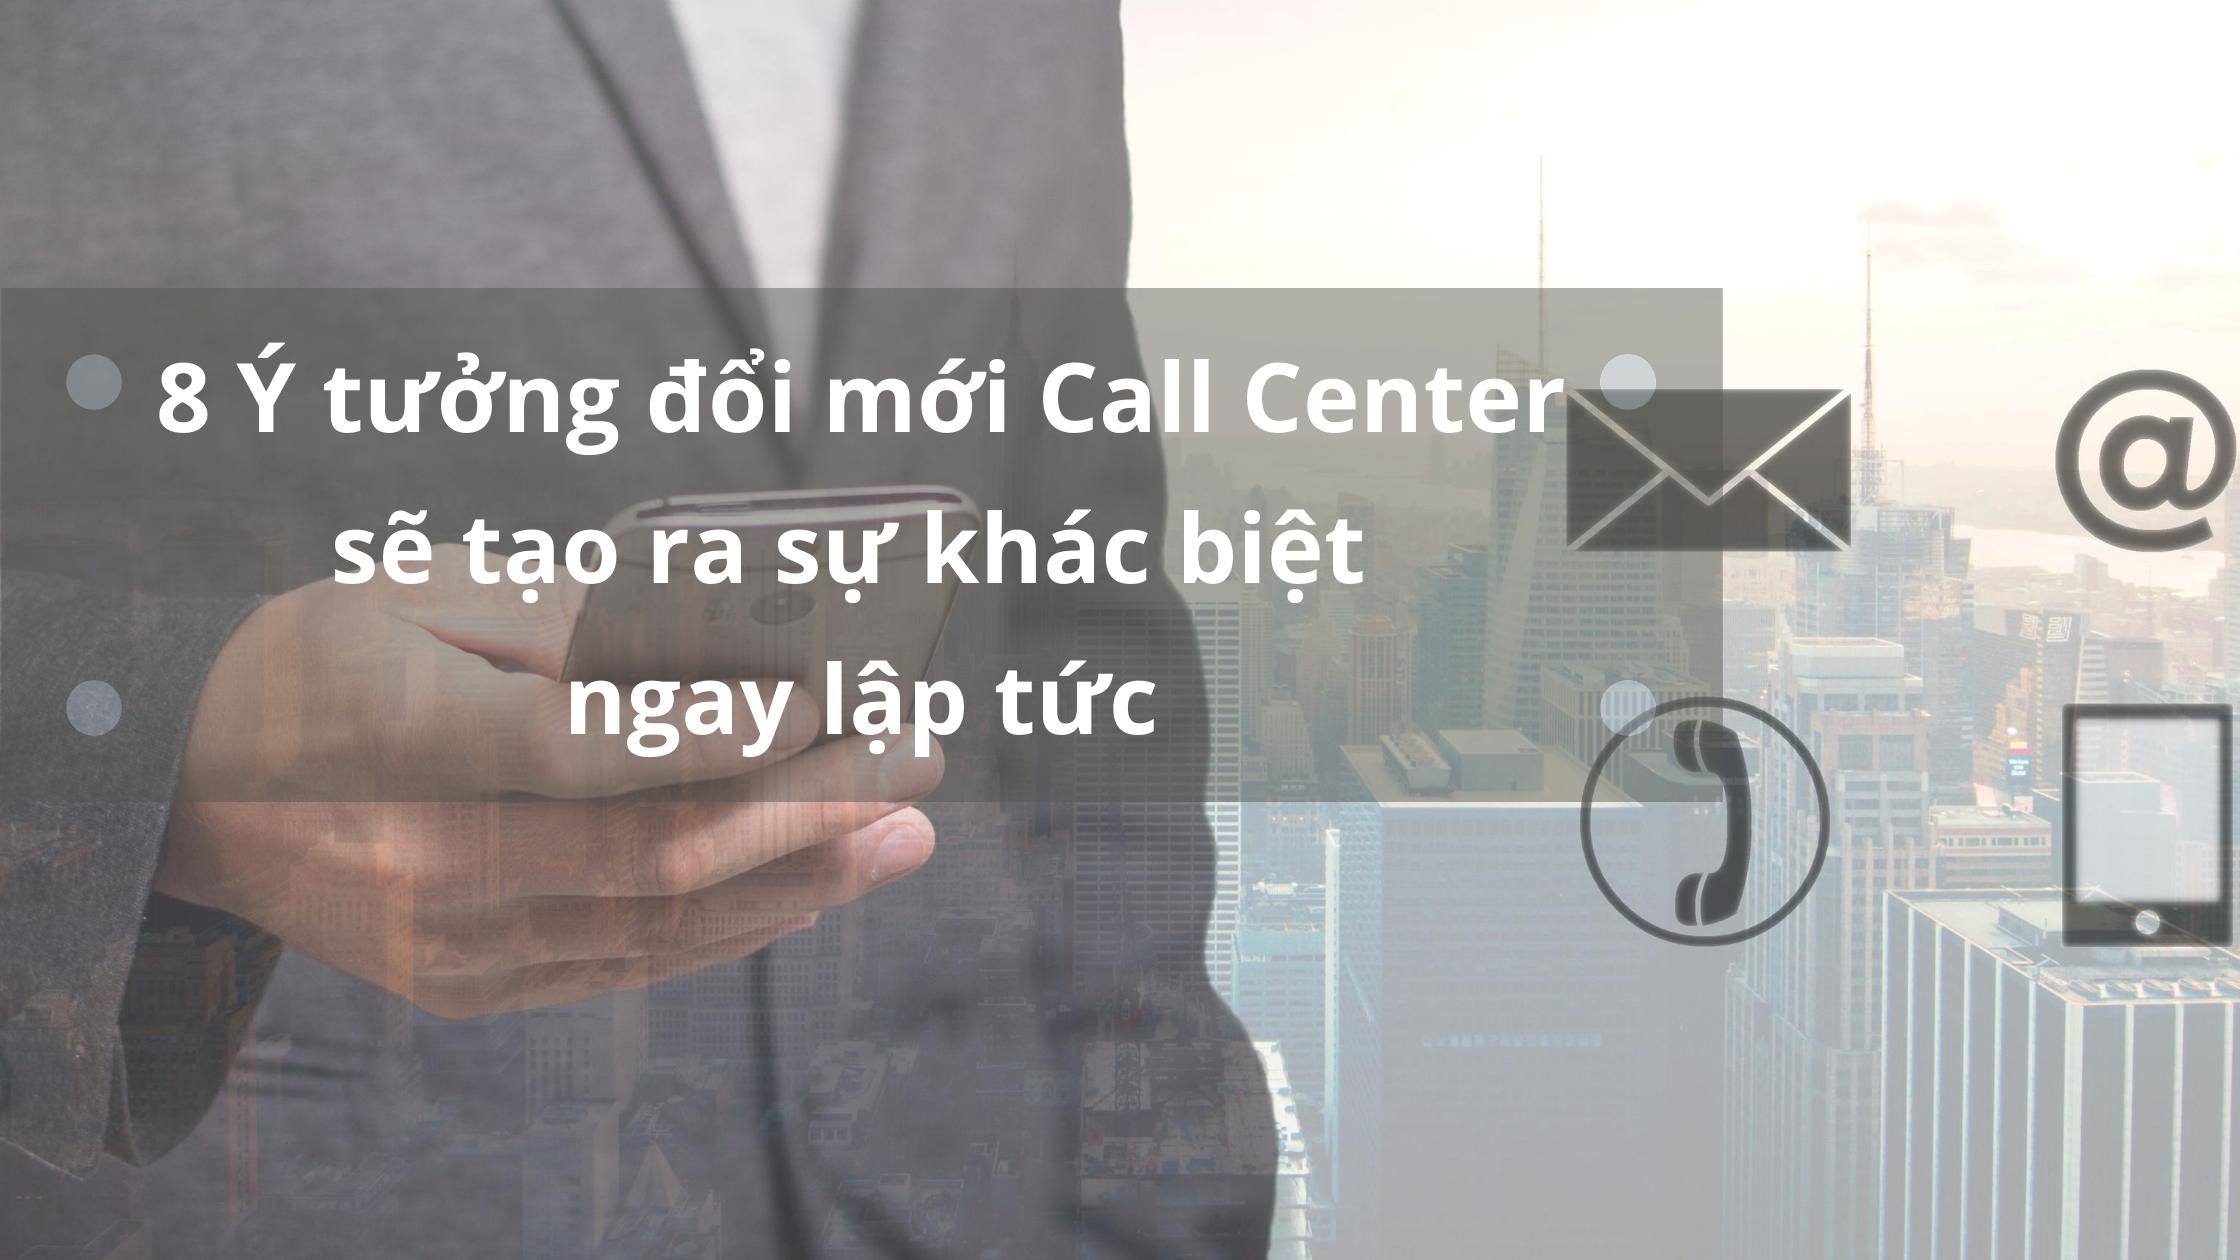 8-y-tuong-doi-moi-call-center-se-tao-ra-khac-biet-ngay-lap-tuc